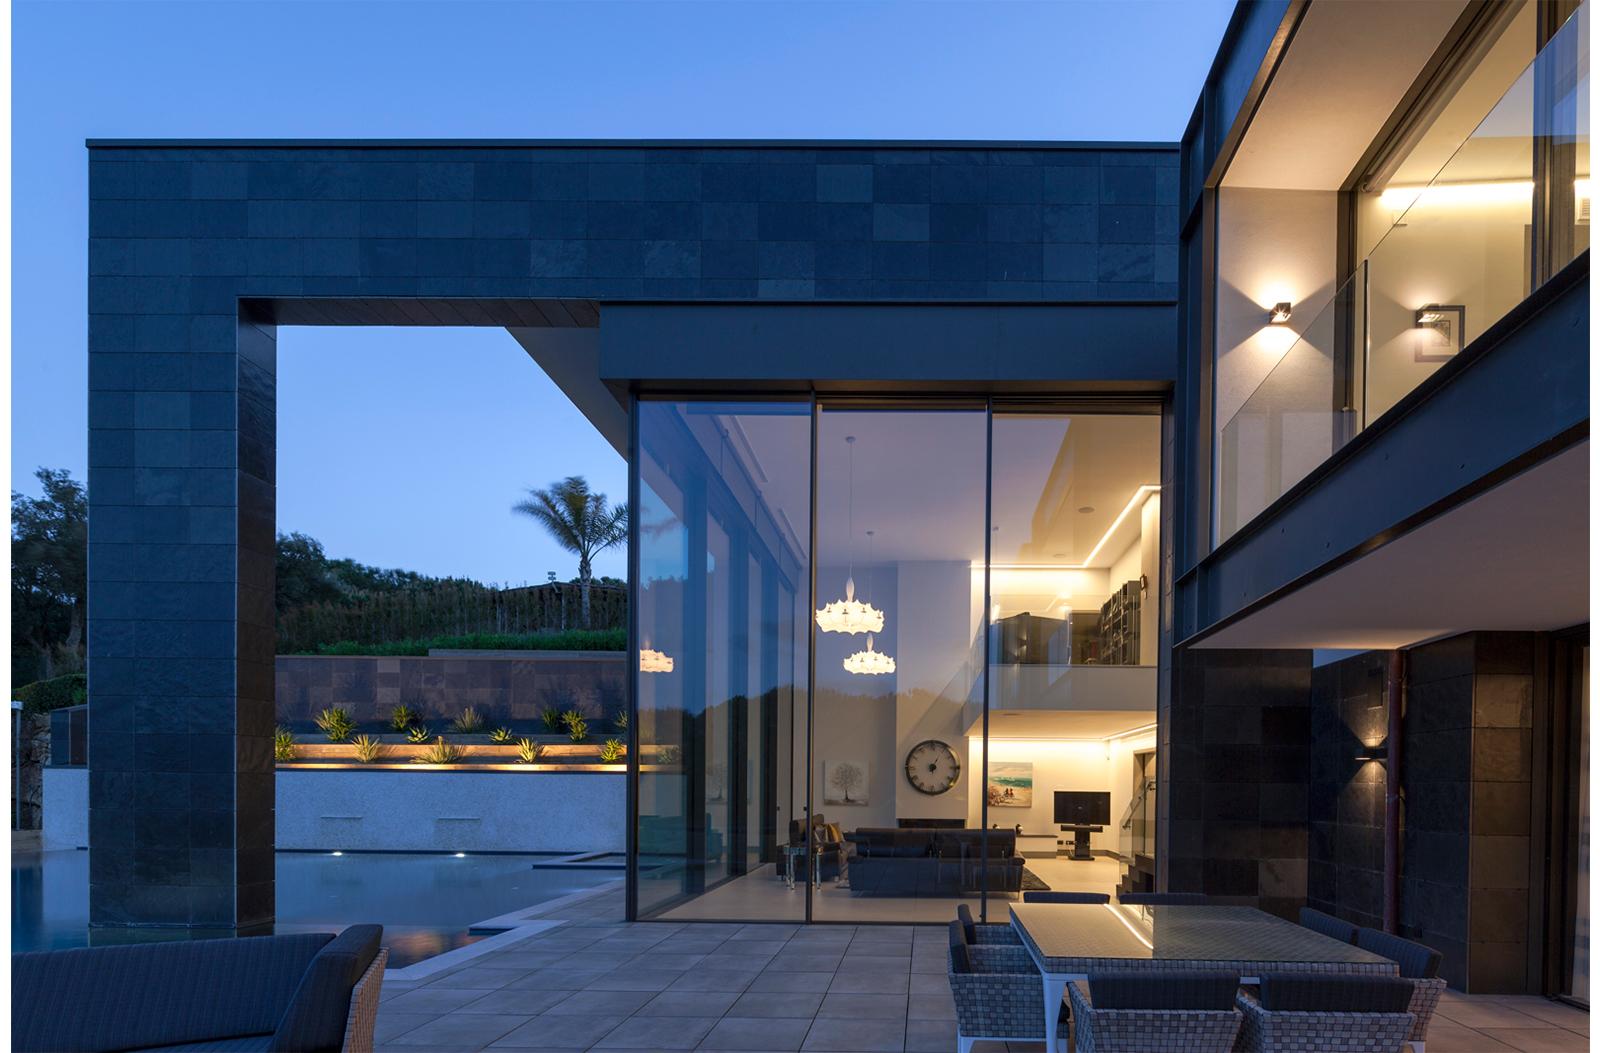 Villa-Kearney-Residential-Villa-Project-Architect-Spain-14